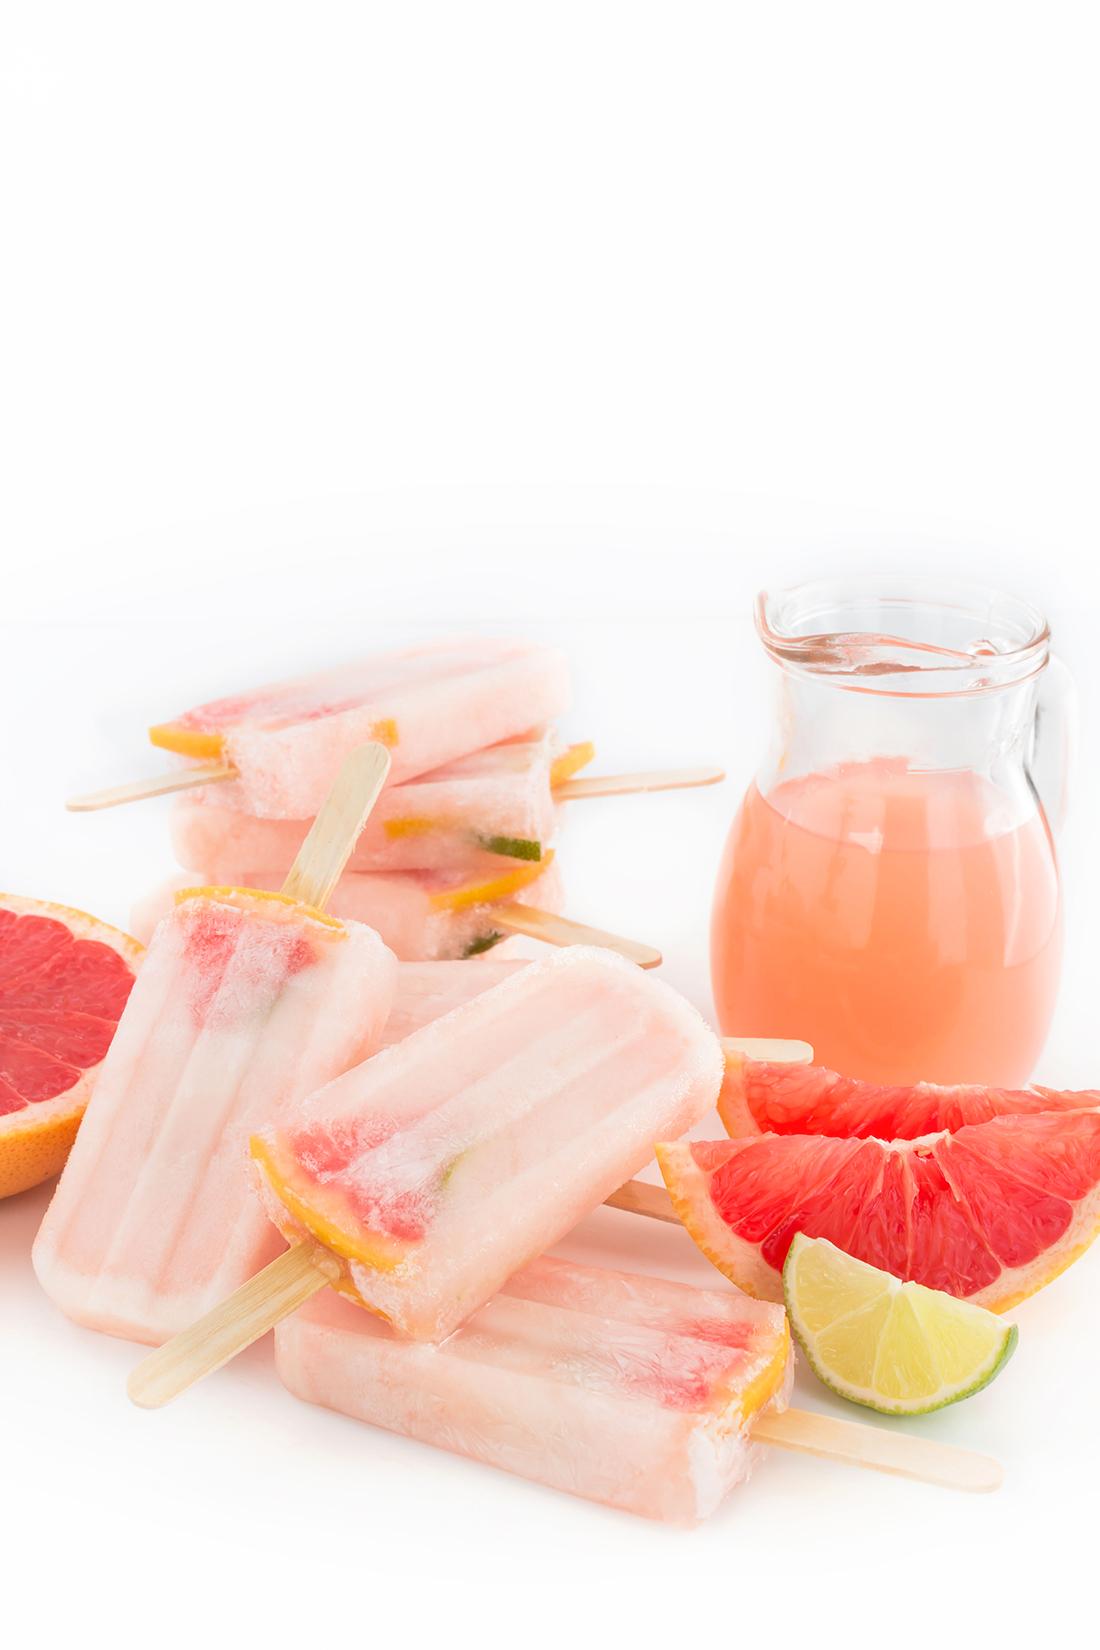 VEGAN 3 INGREDIENTS PINK GRAPEFRUIT POPSICLES - GHIACCIOLI al POMPELMO ROSA 3 ingredienti idratanti limonata al pompelmo